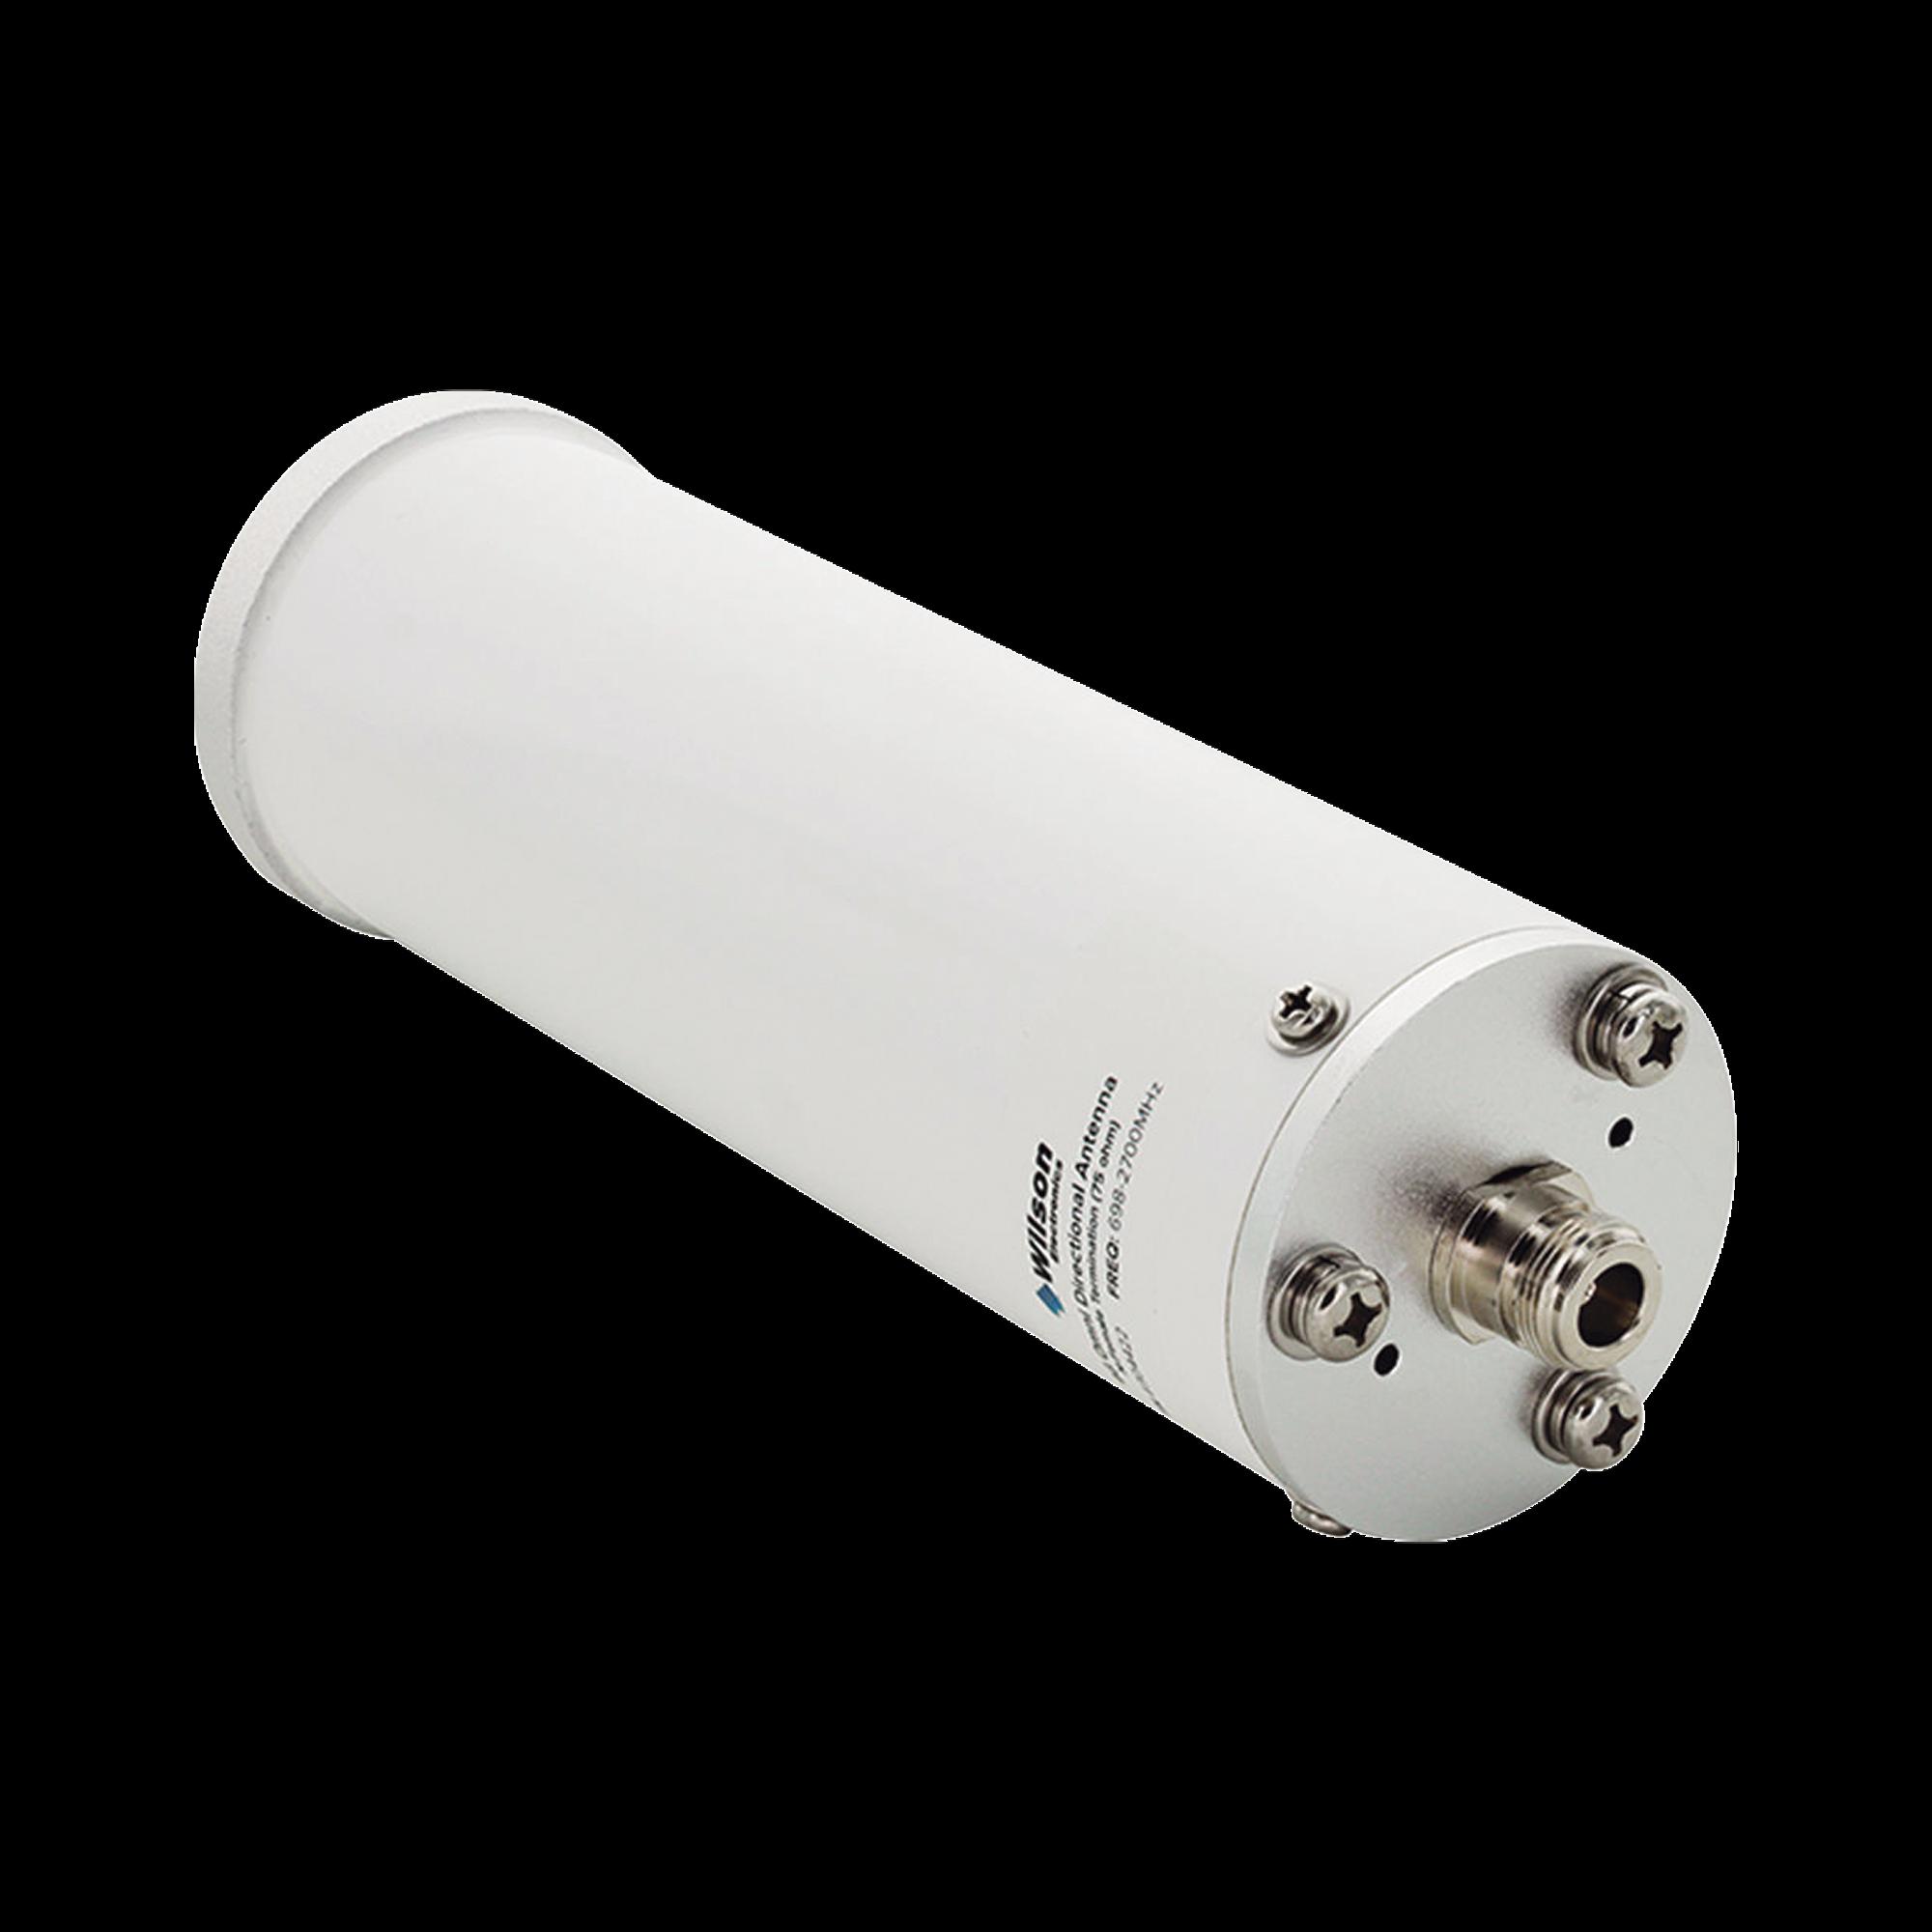 Antena PLUS Omnidireccional 4G LTE | Soporta todas las Bandas de Frecuencia Celular | 5 dBi de Ganancia Máxima